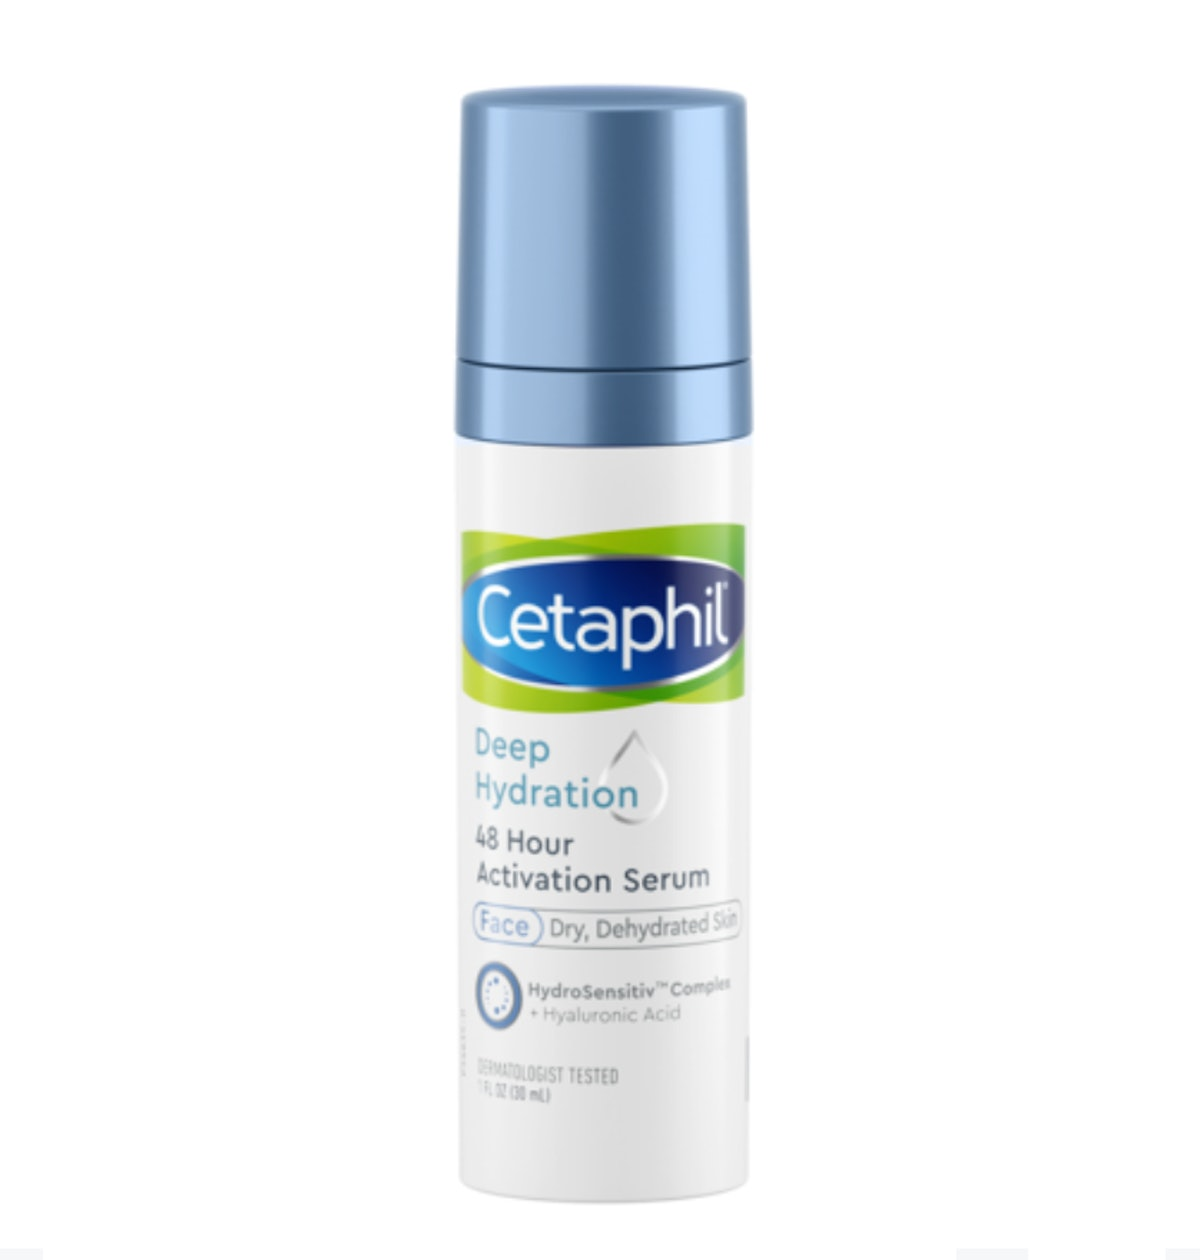 Cetaphil Deep Hydration 48 Hour Activation Serum